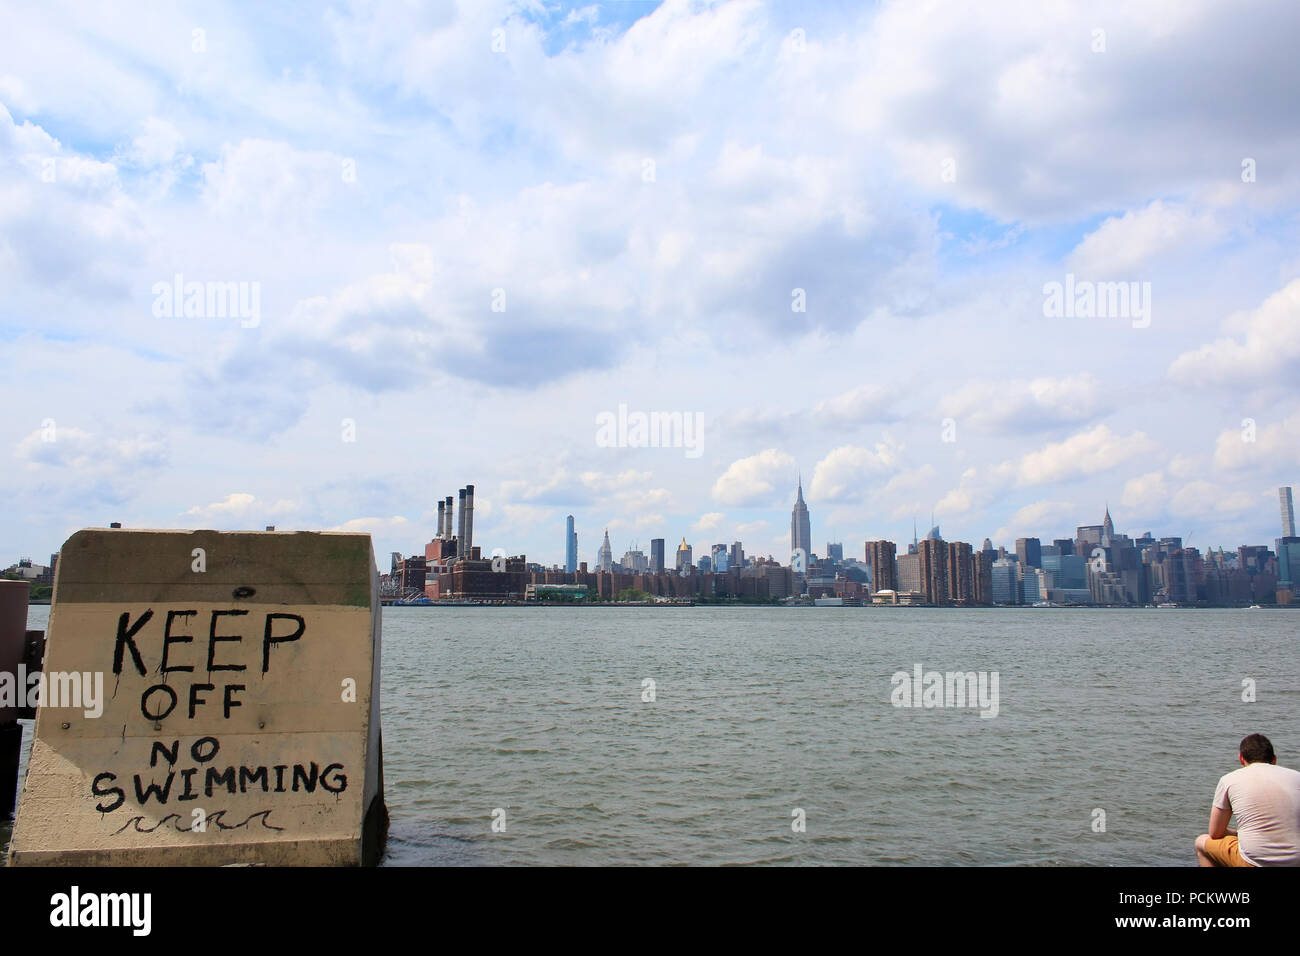 Keep off, no swimming graffiti on a concrete slab, Smorgasburg in Williamsburg, Brooklyn on JULY 8th, 2017 in New York, USA. (Photo by Wojciech Migda) Stock Photo